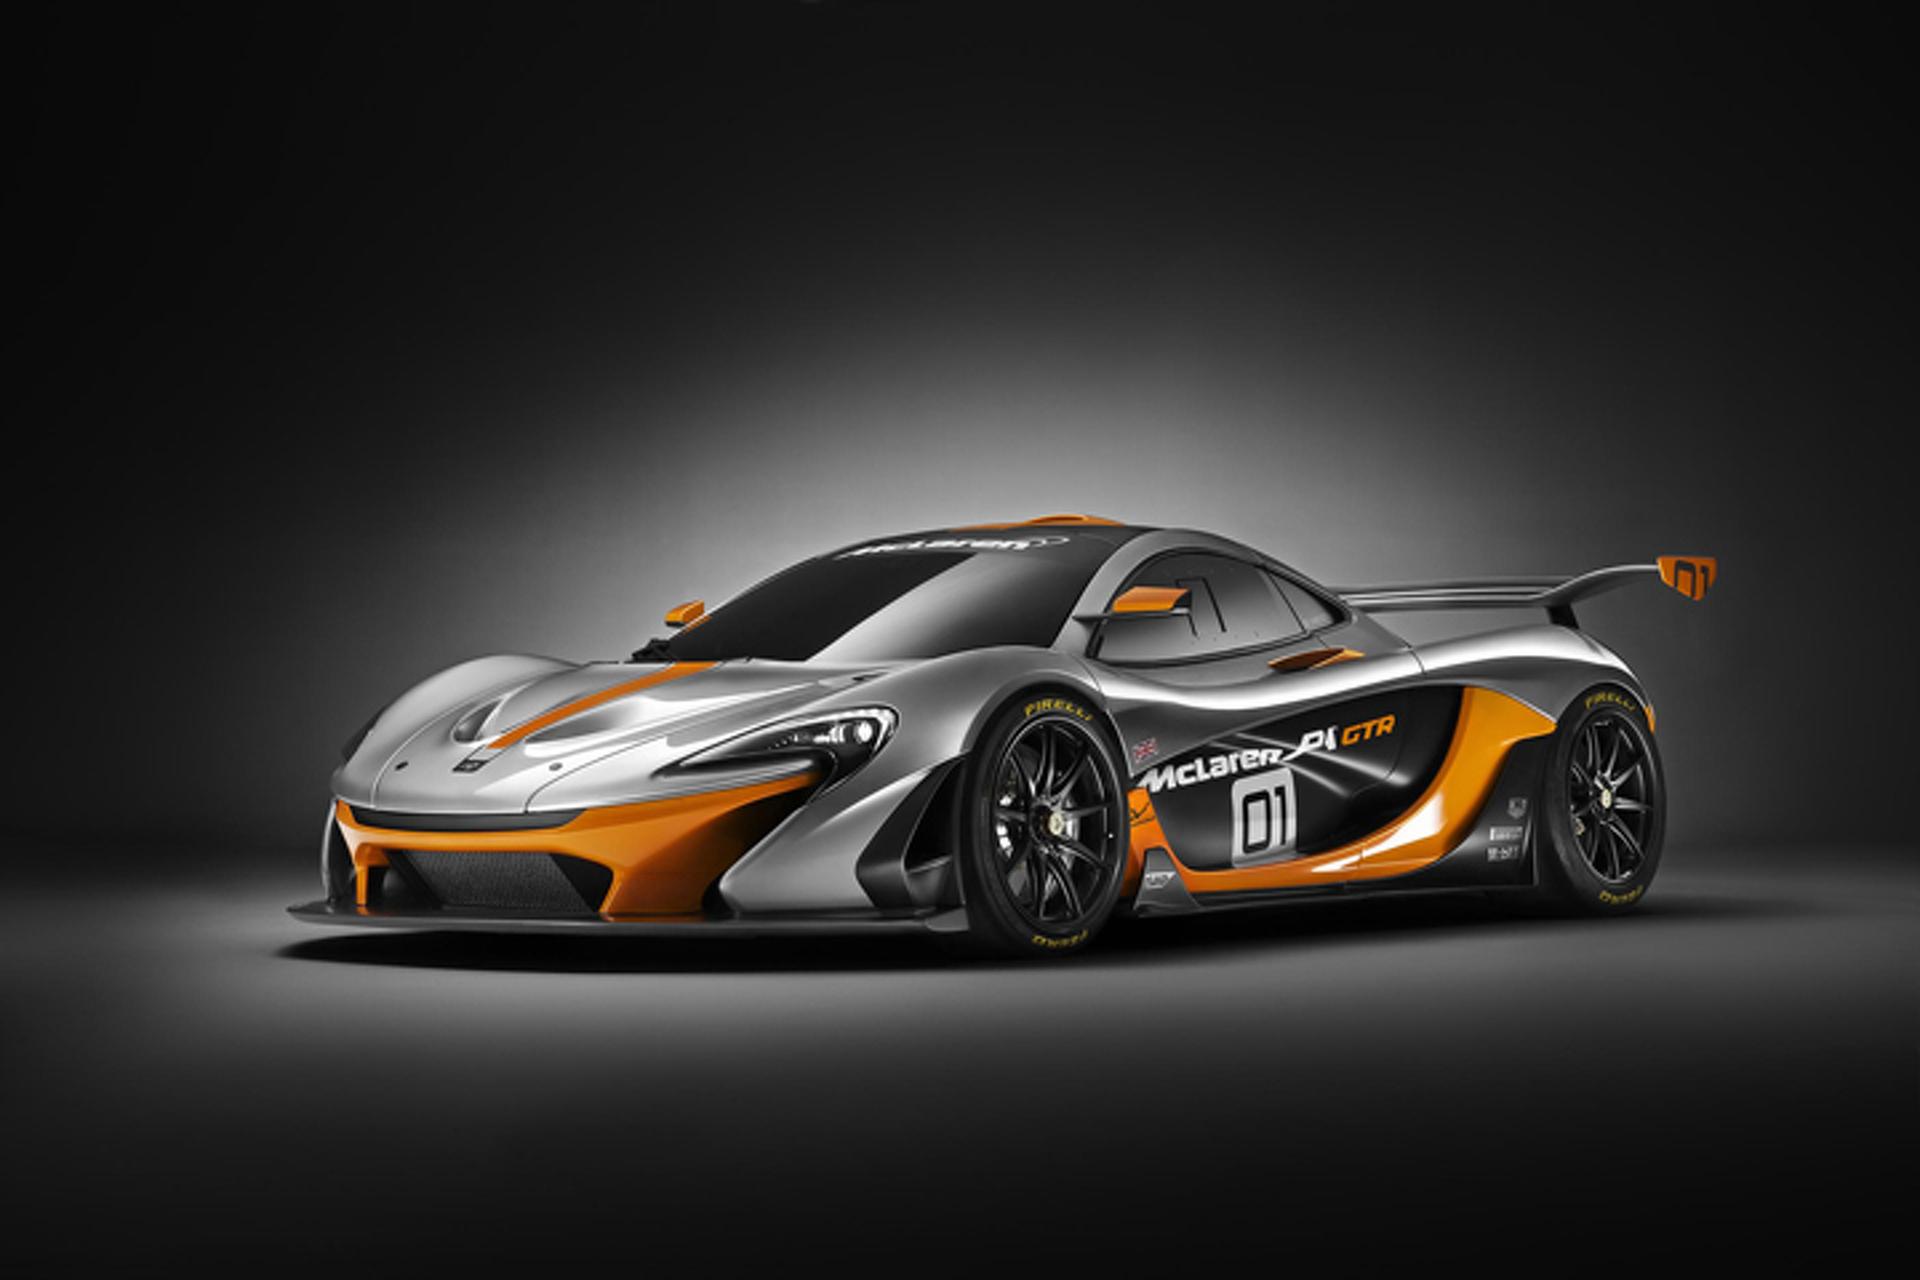 Ferrari FXX K or McLaren P1 GTR: Which Is More Extreme?